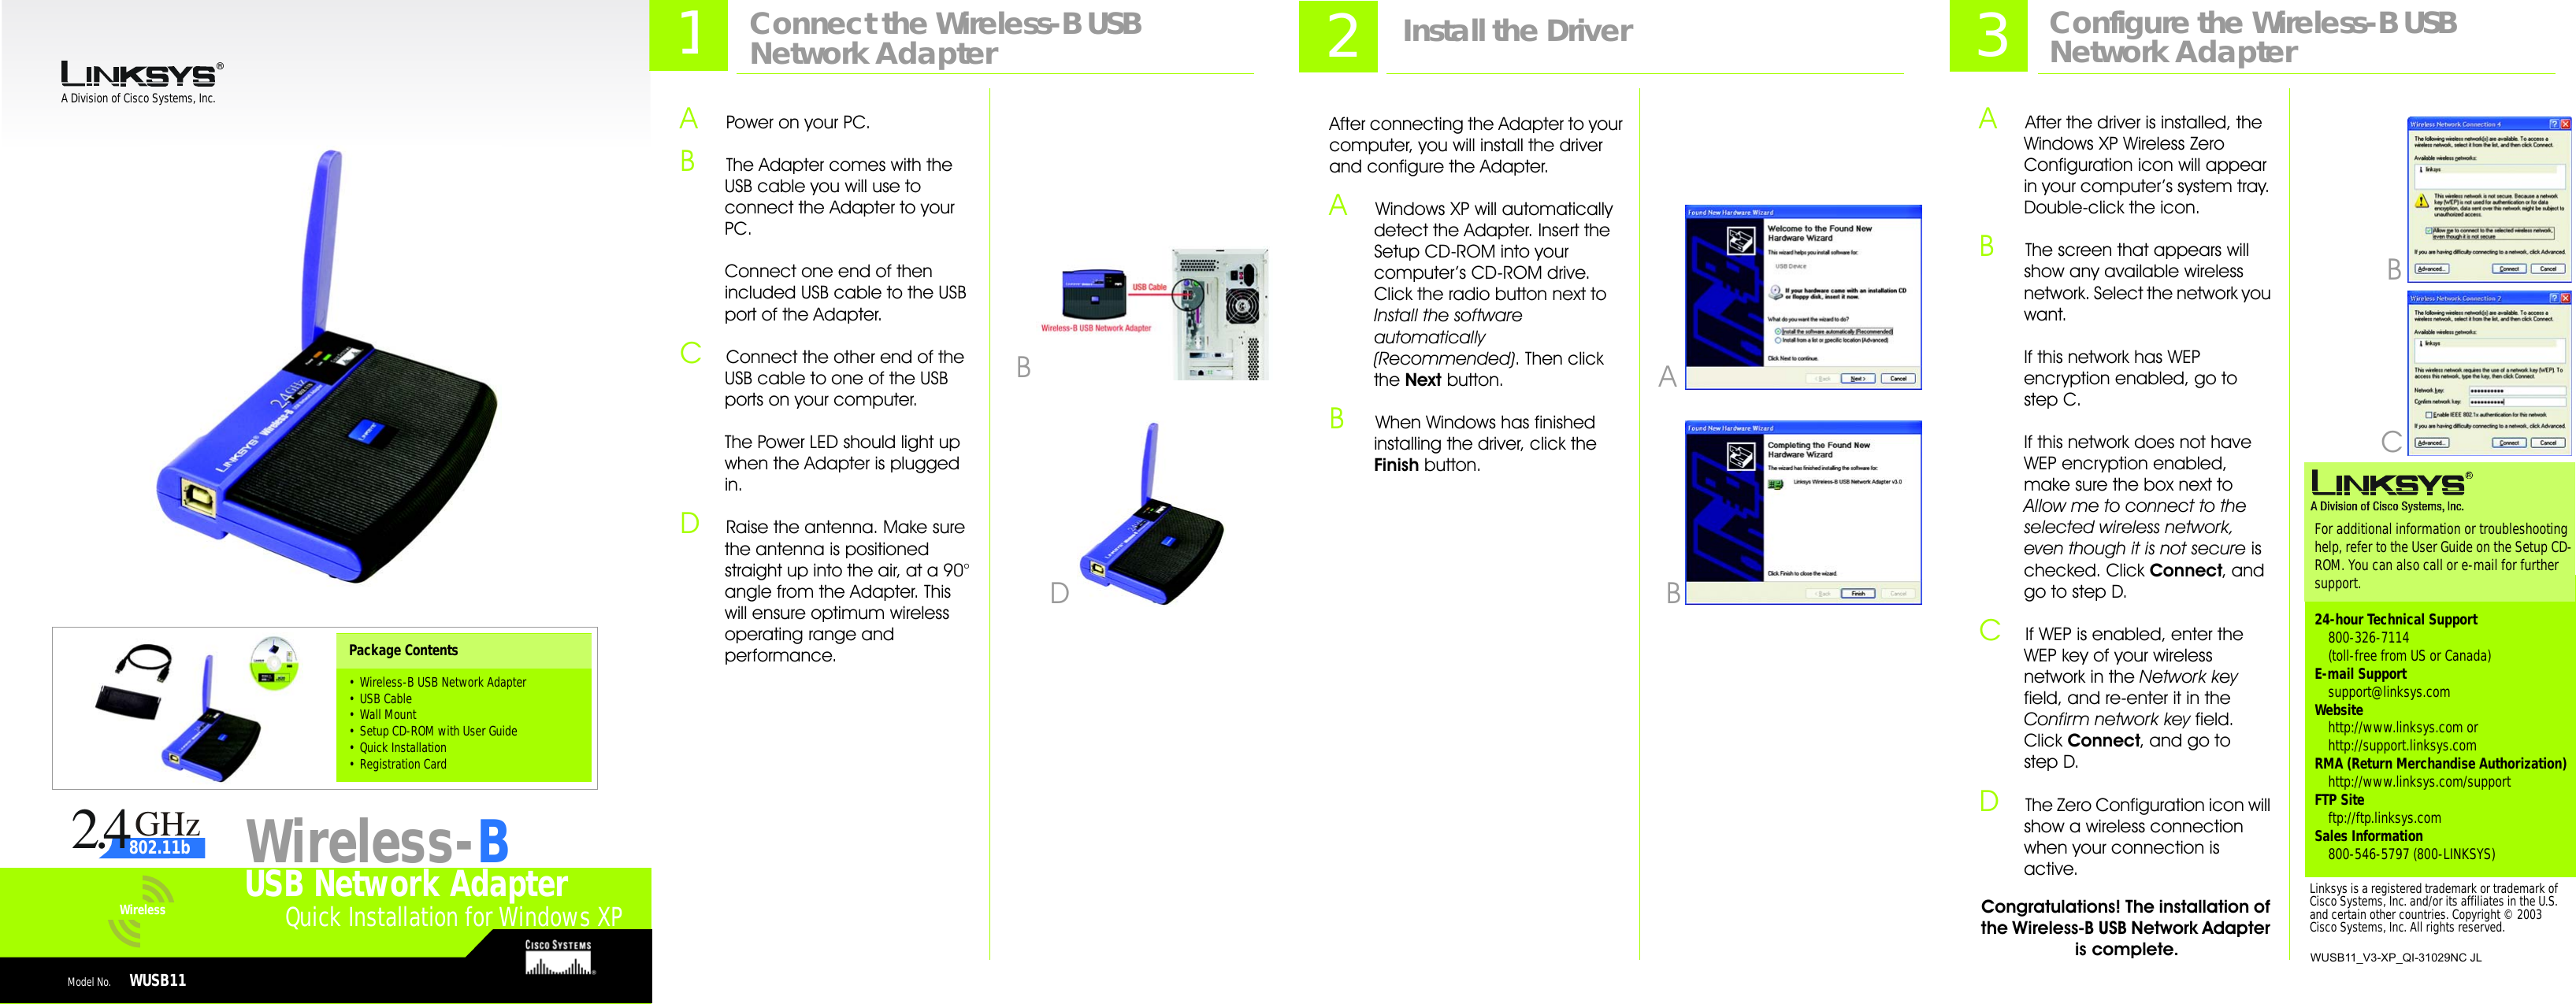 LINKSYS WUSB11 V3.0 DOWNLOAD DRIVER